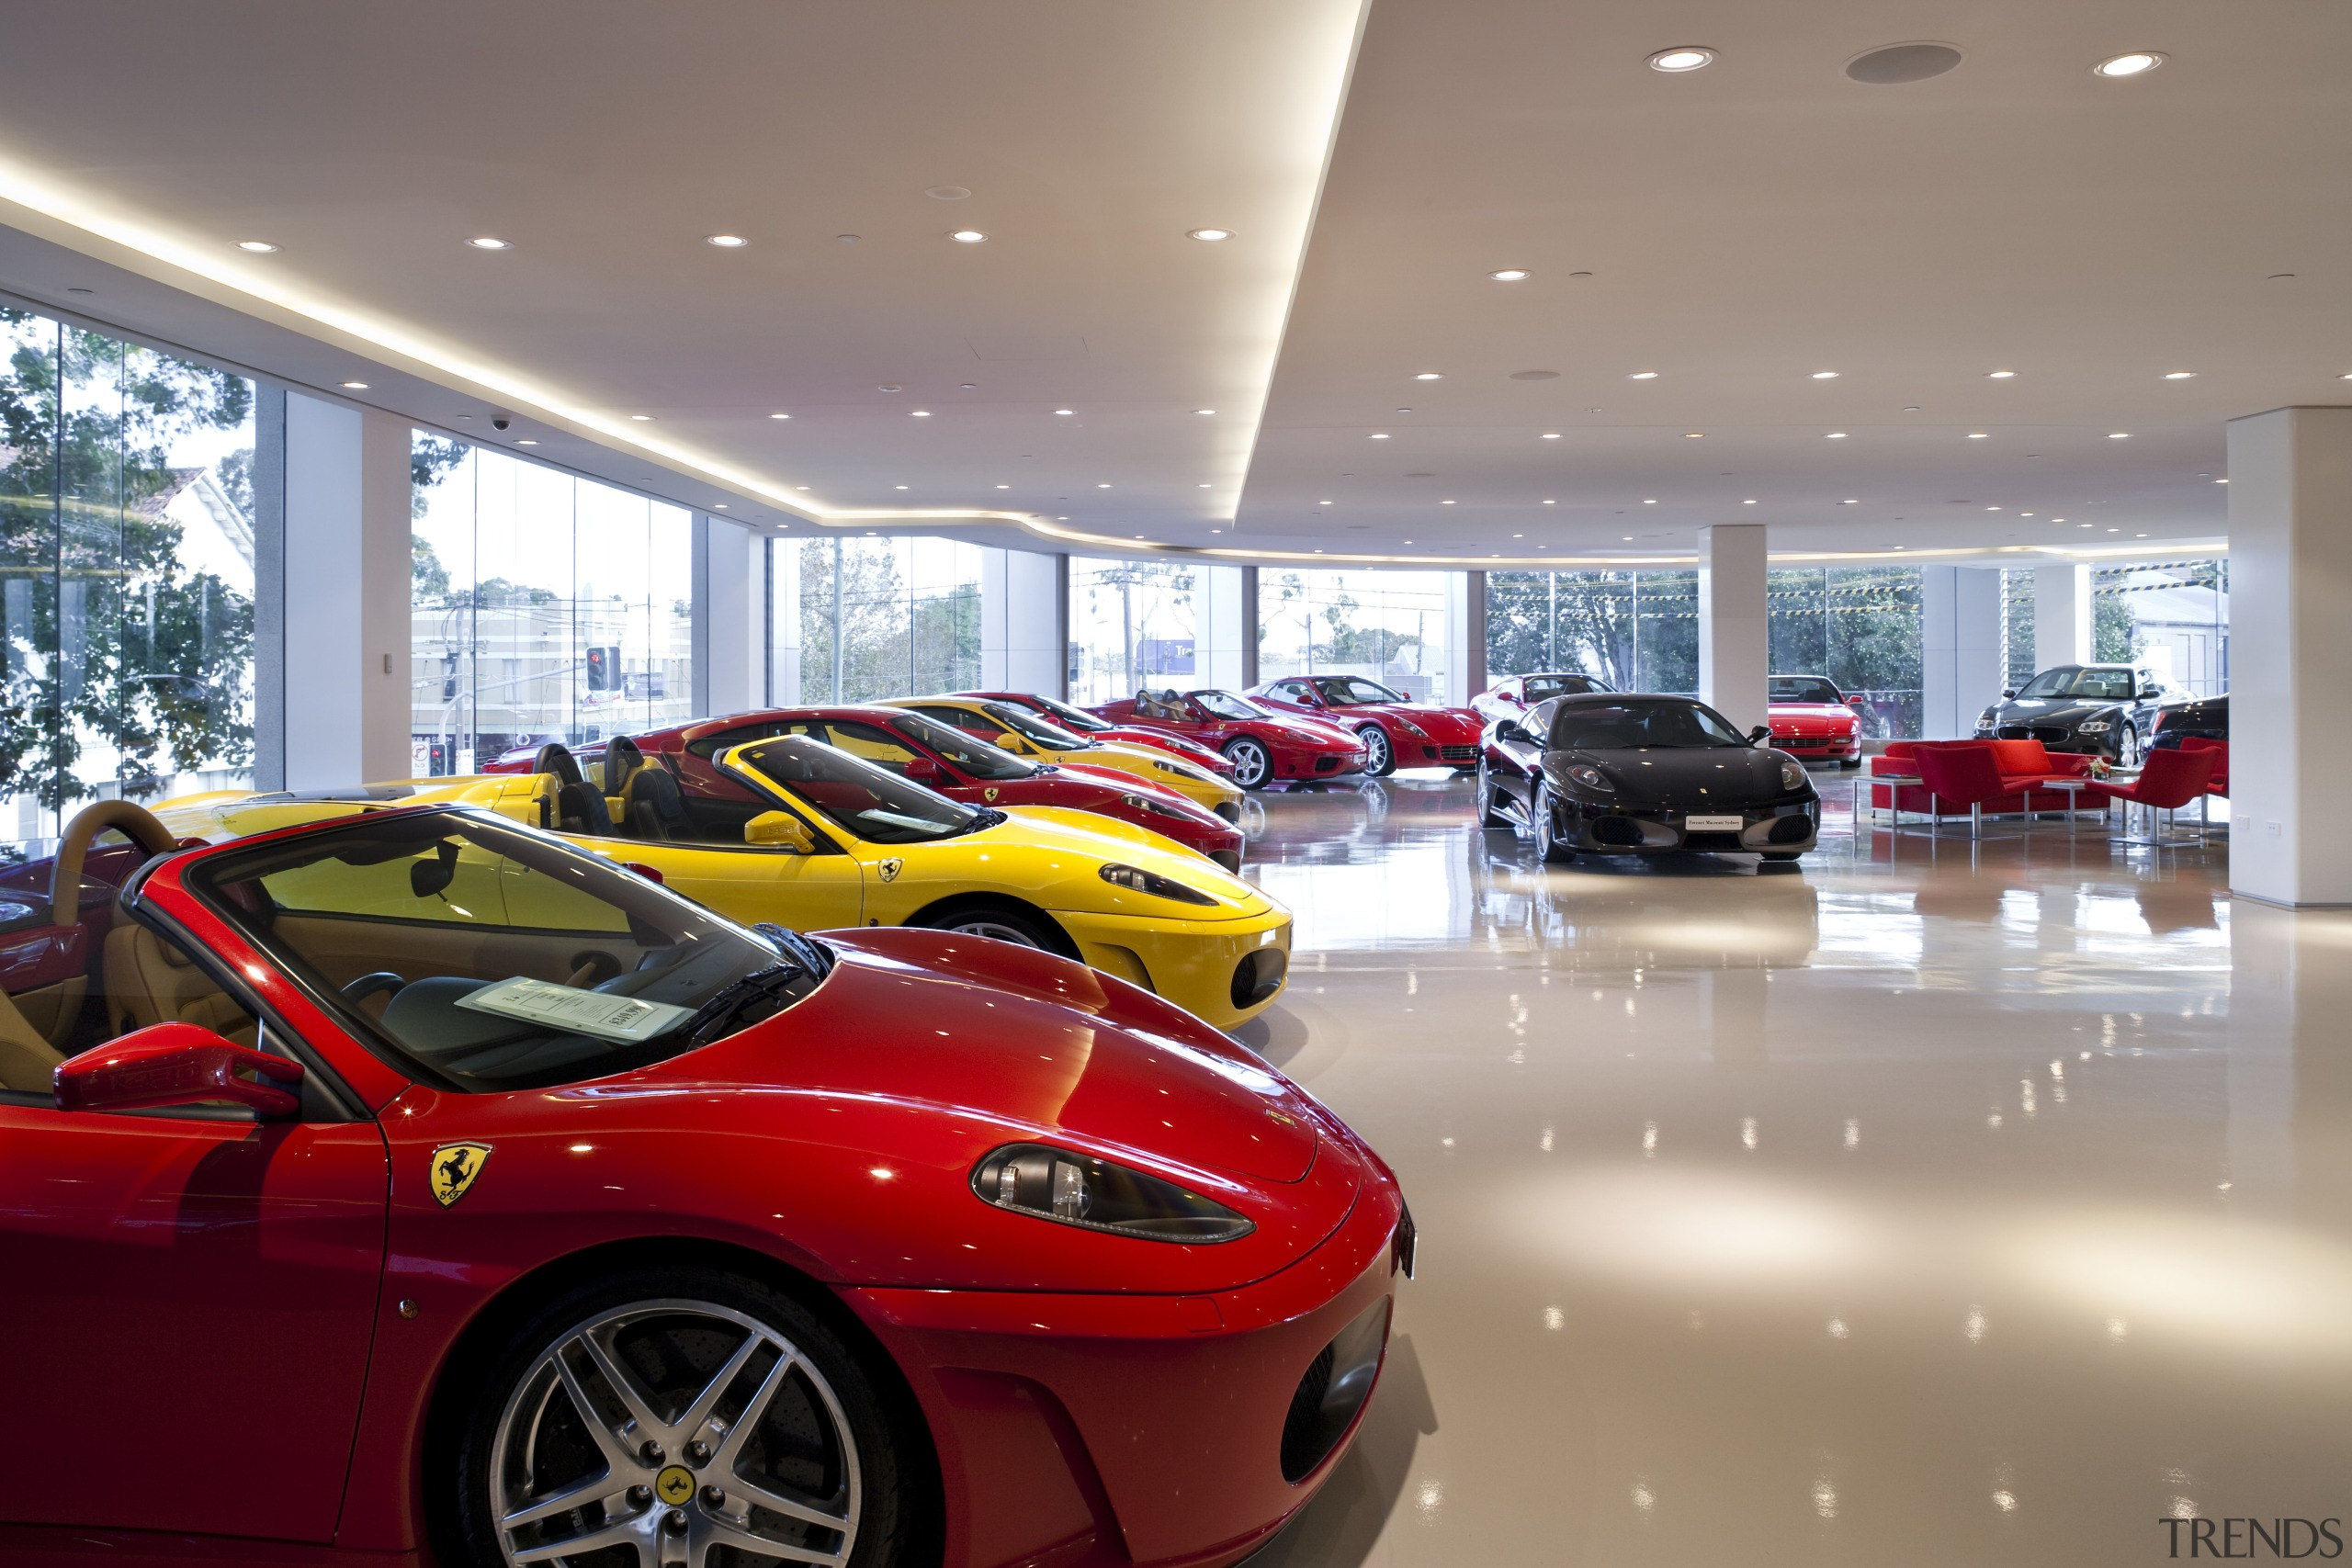 Ferrari Showroom in Australia - Ferrari Showroom in auto show, automotive design, car, ferrari f430, land vehicle, luxury vehicle, motor vehicle, performance car, race car, red, sports car, supercar, vehicle, gray